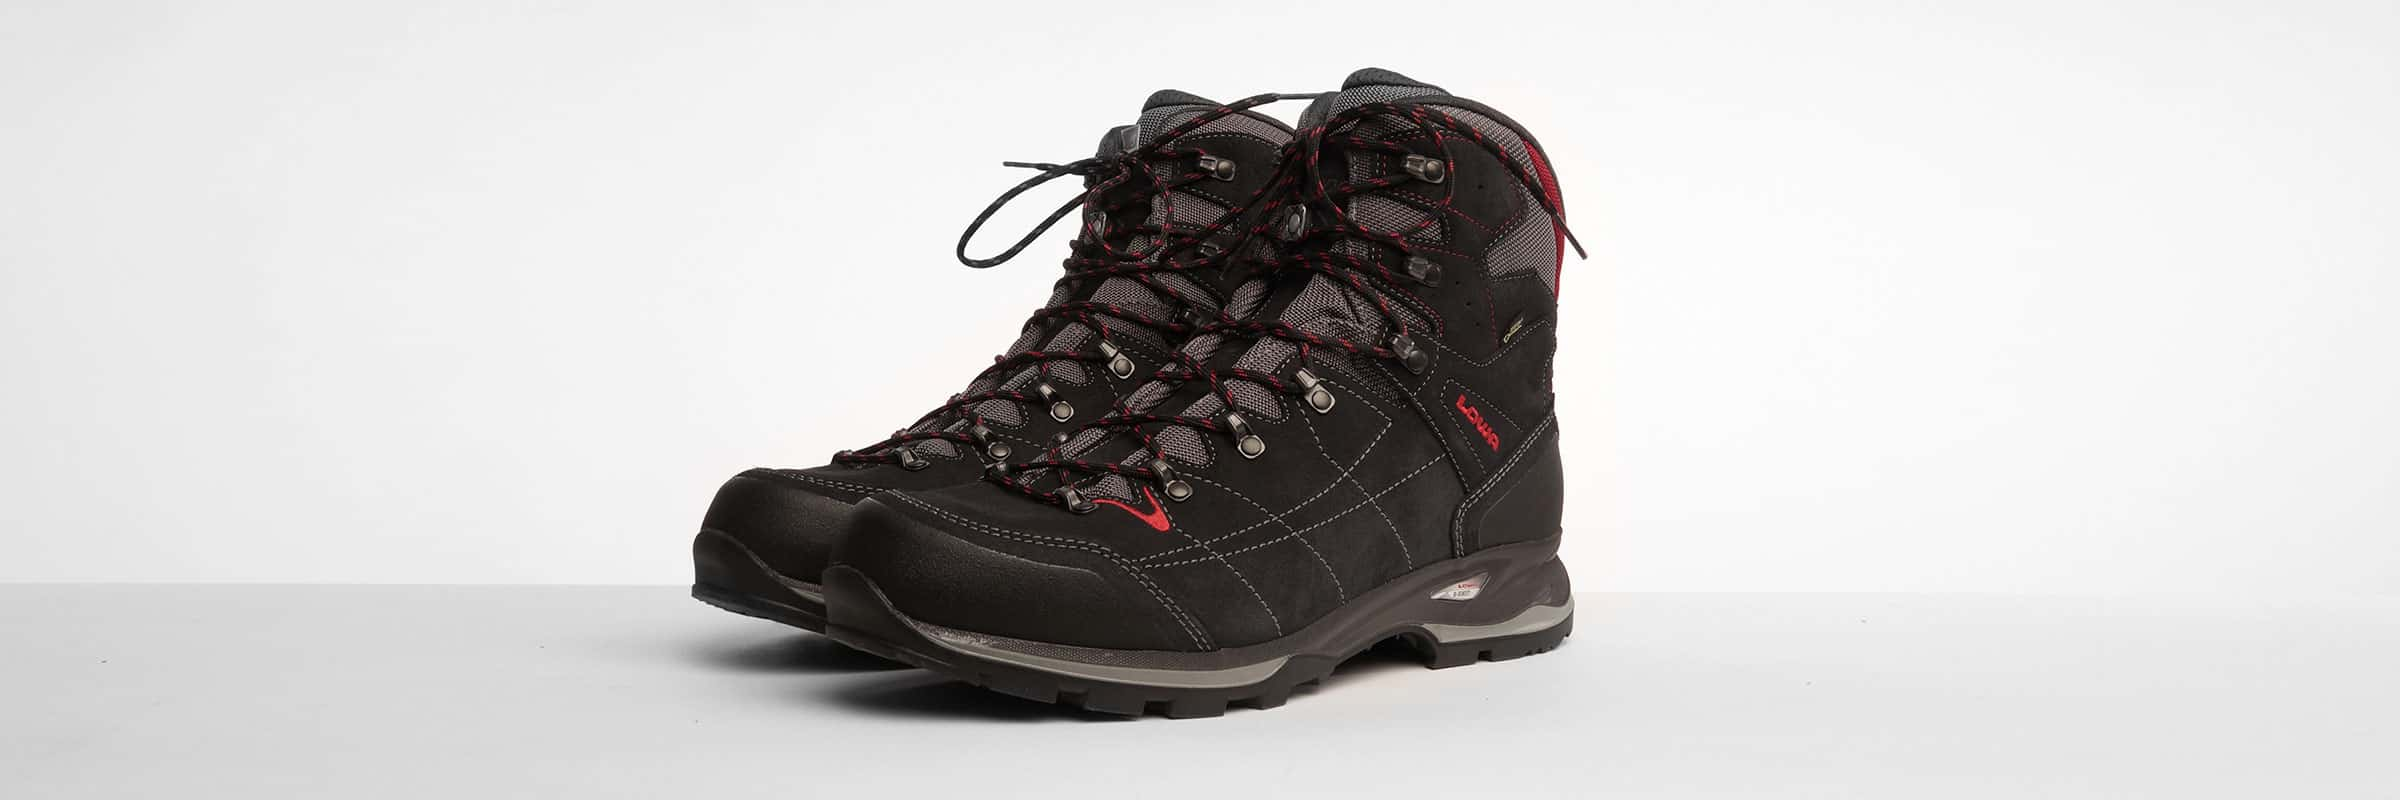 Lowa Vantage GTX Mid Hiking Boots Reviewed